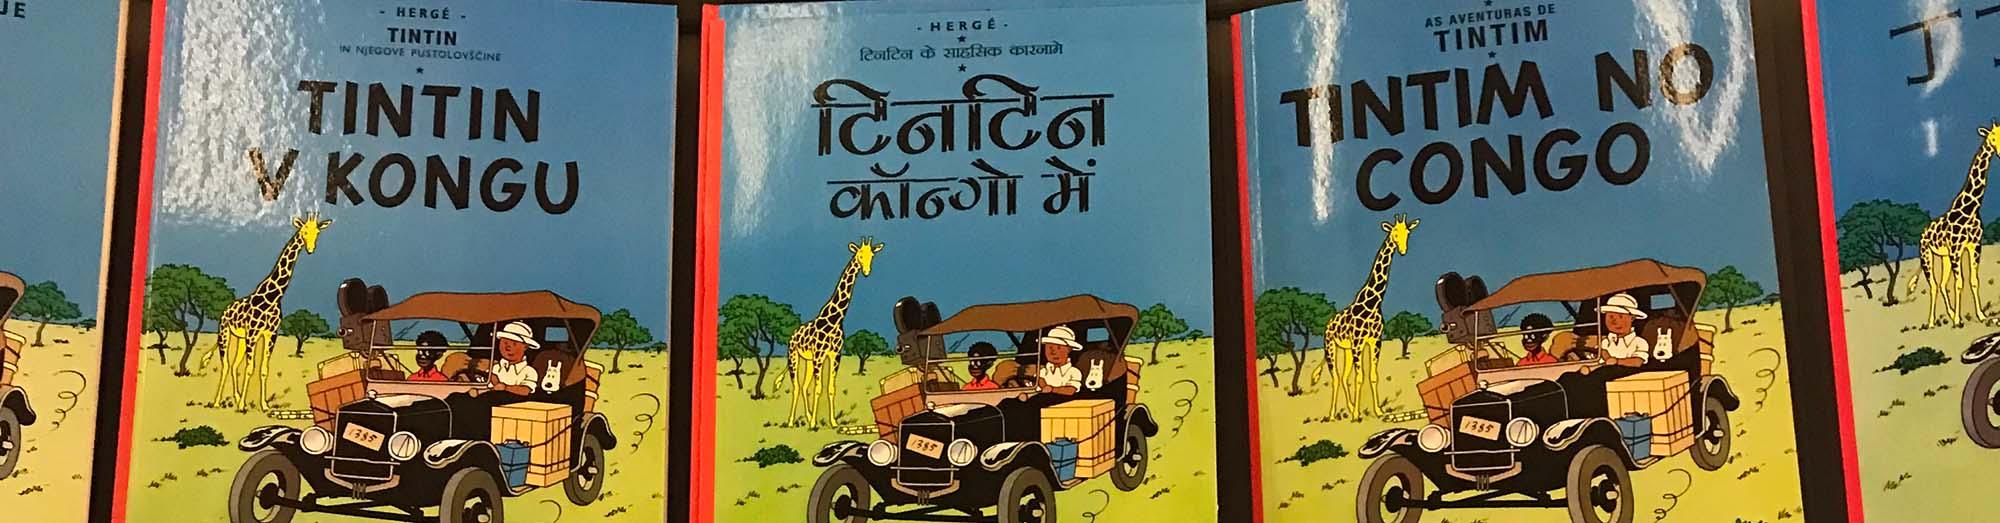 Tintin hindi bengali